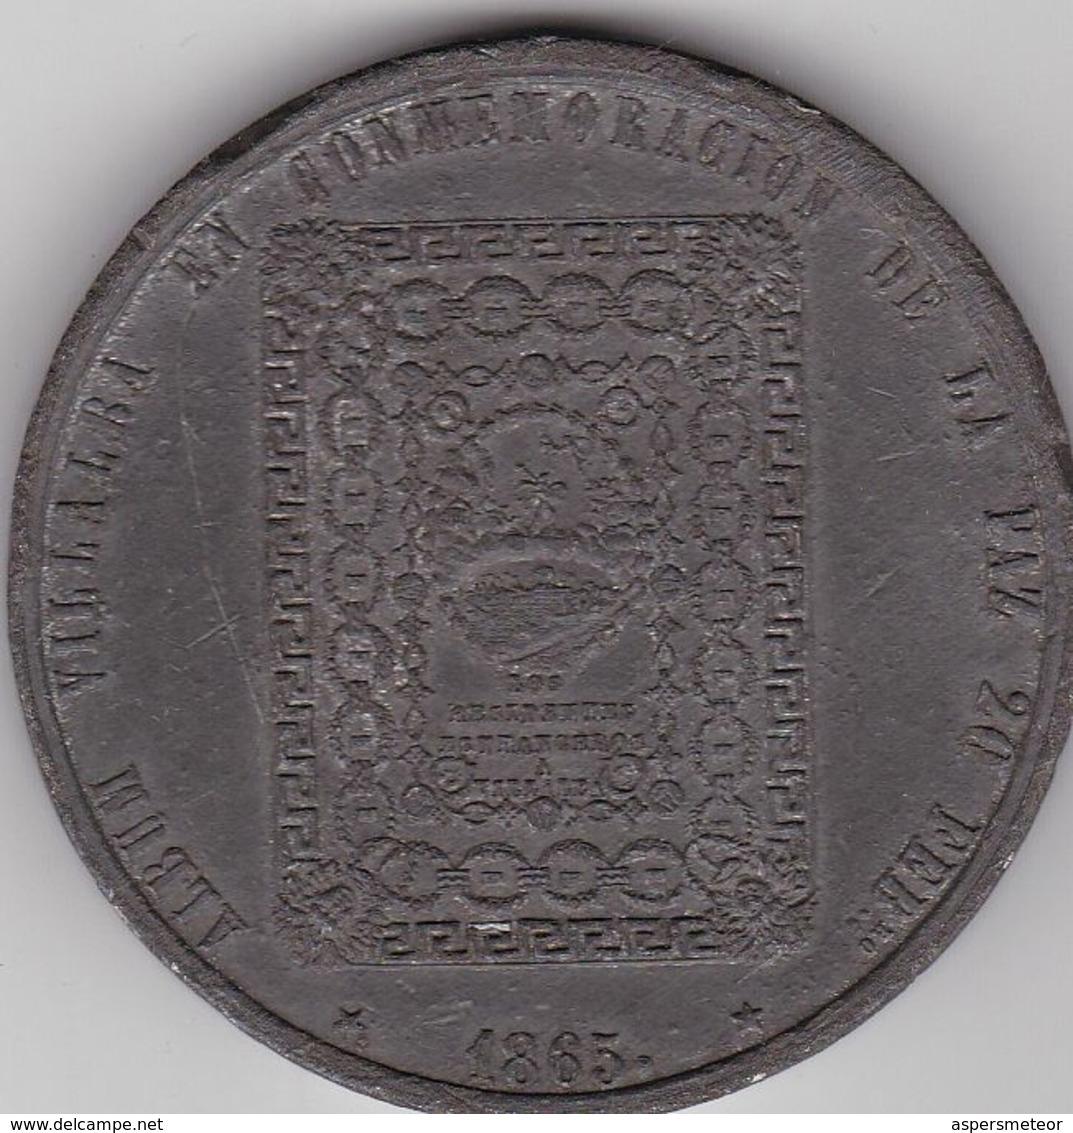 ALBUM VILLALBA EN CONMEMORACION DE LA PLAZ, 20 FEBRERO 1865. FIRMA CATALDI GRABO. GUERRA DEL PARAGUAY -LILHU - Autres